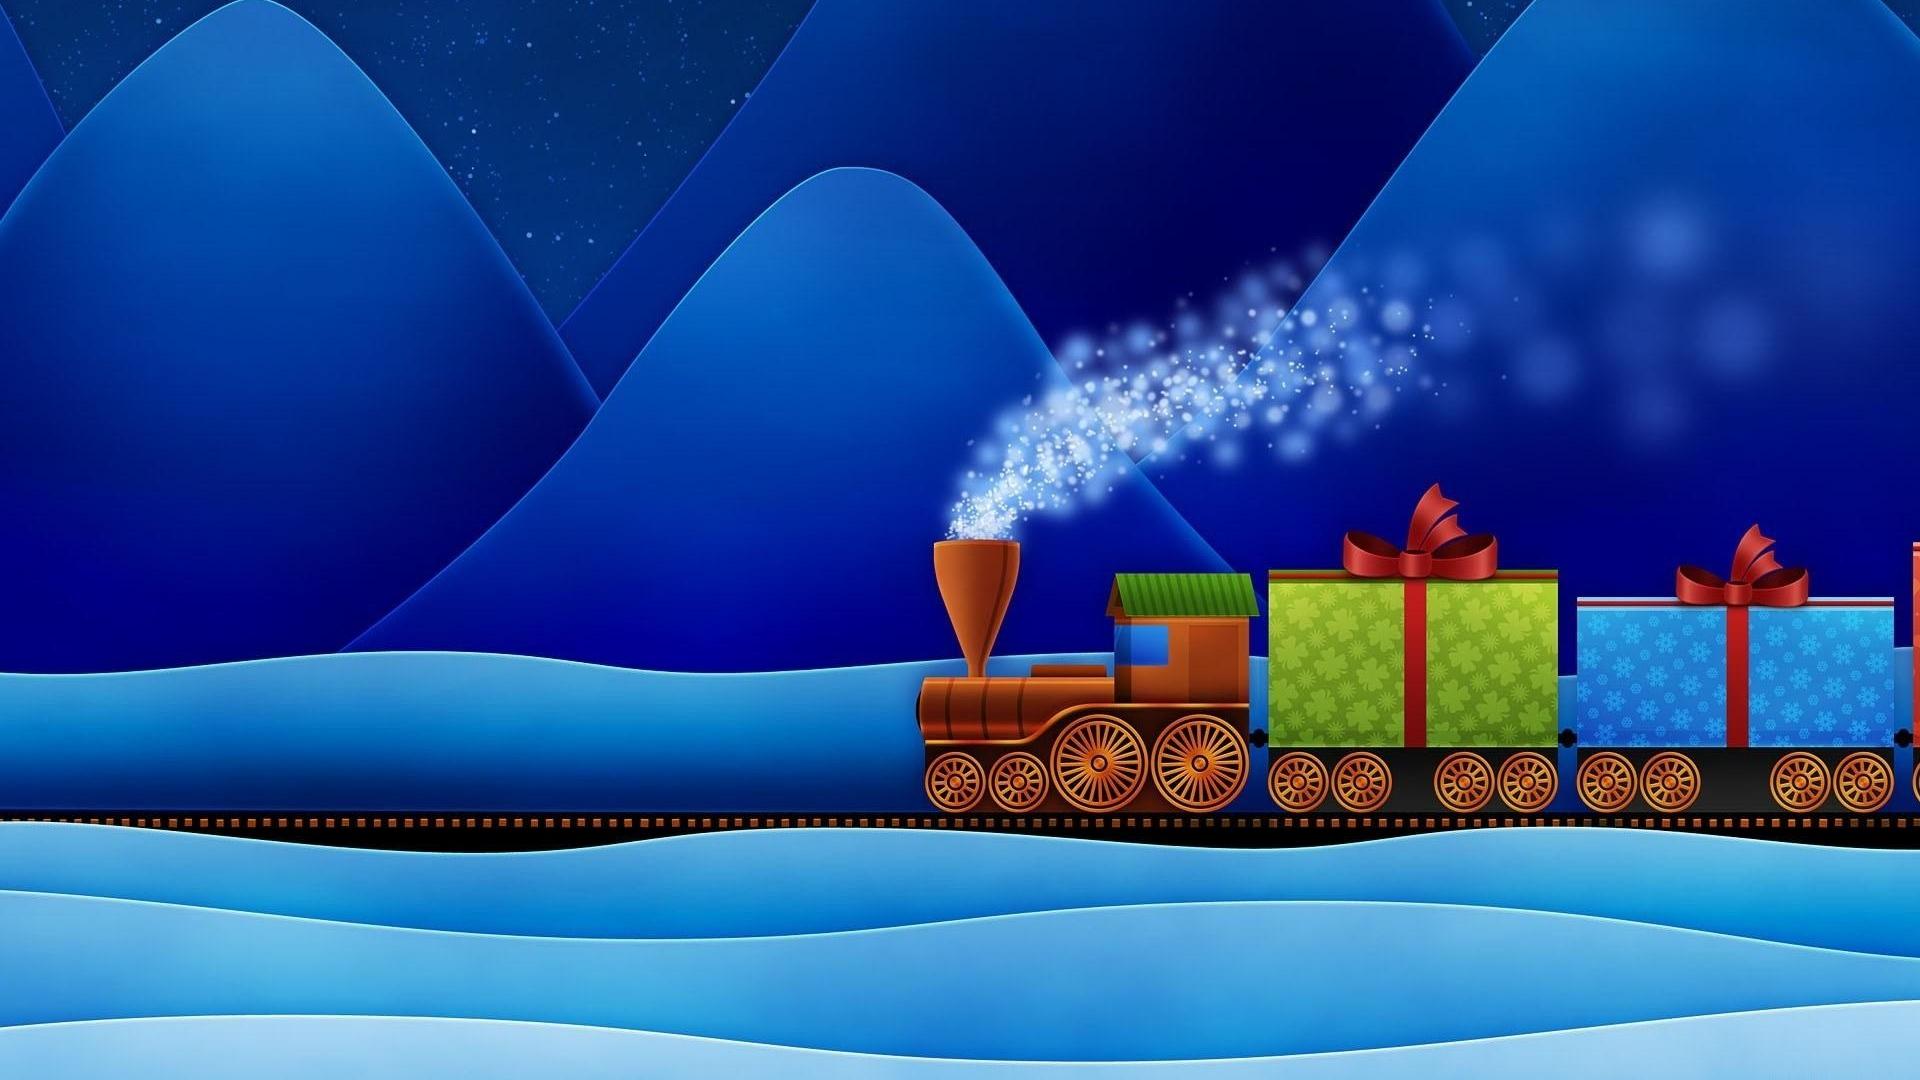 Amazing Wallpaper Mountain Christmas - locomotive_rail_gifts_mountain_christmas_holiday_41889_1920x1080  Trends_97214.jpg